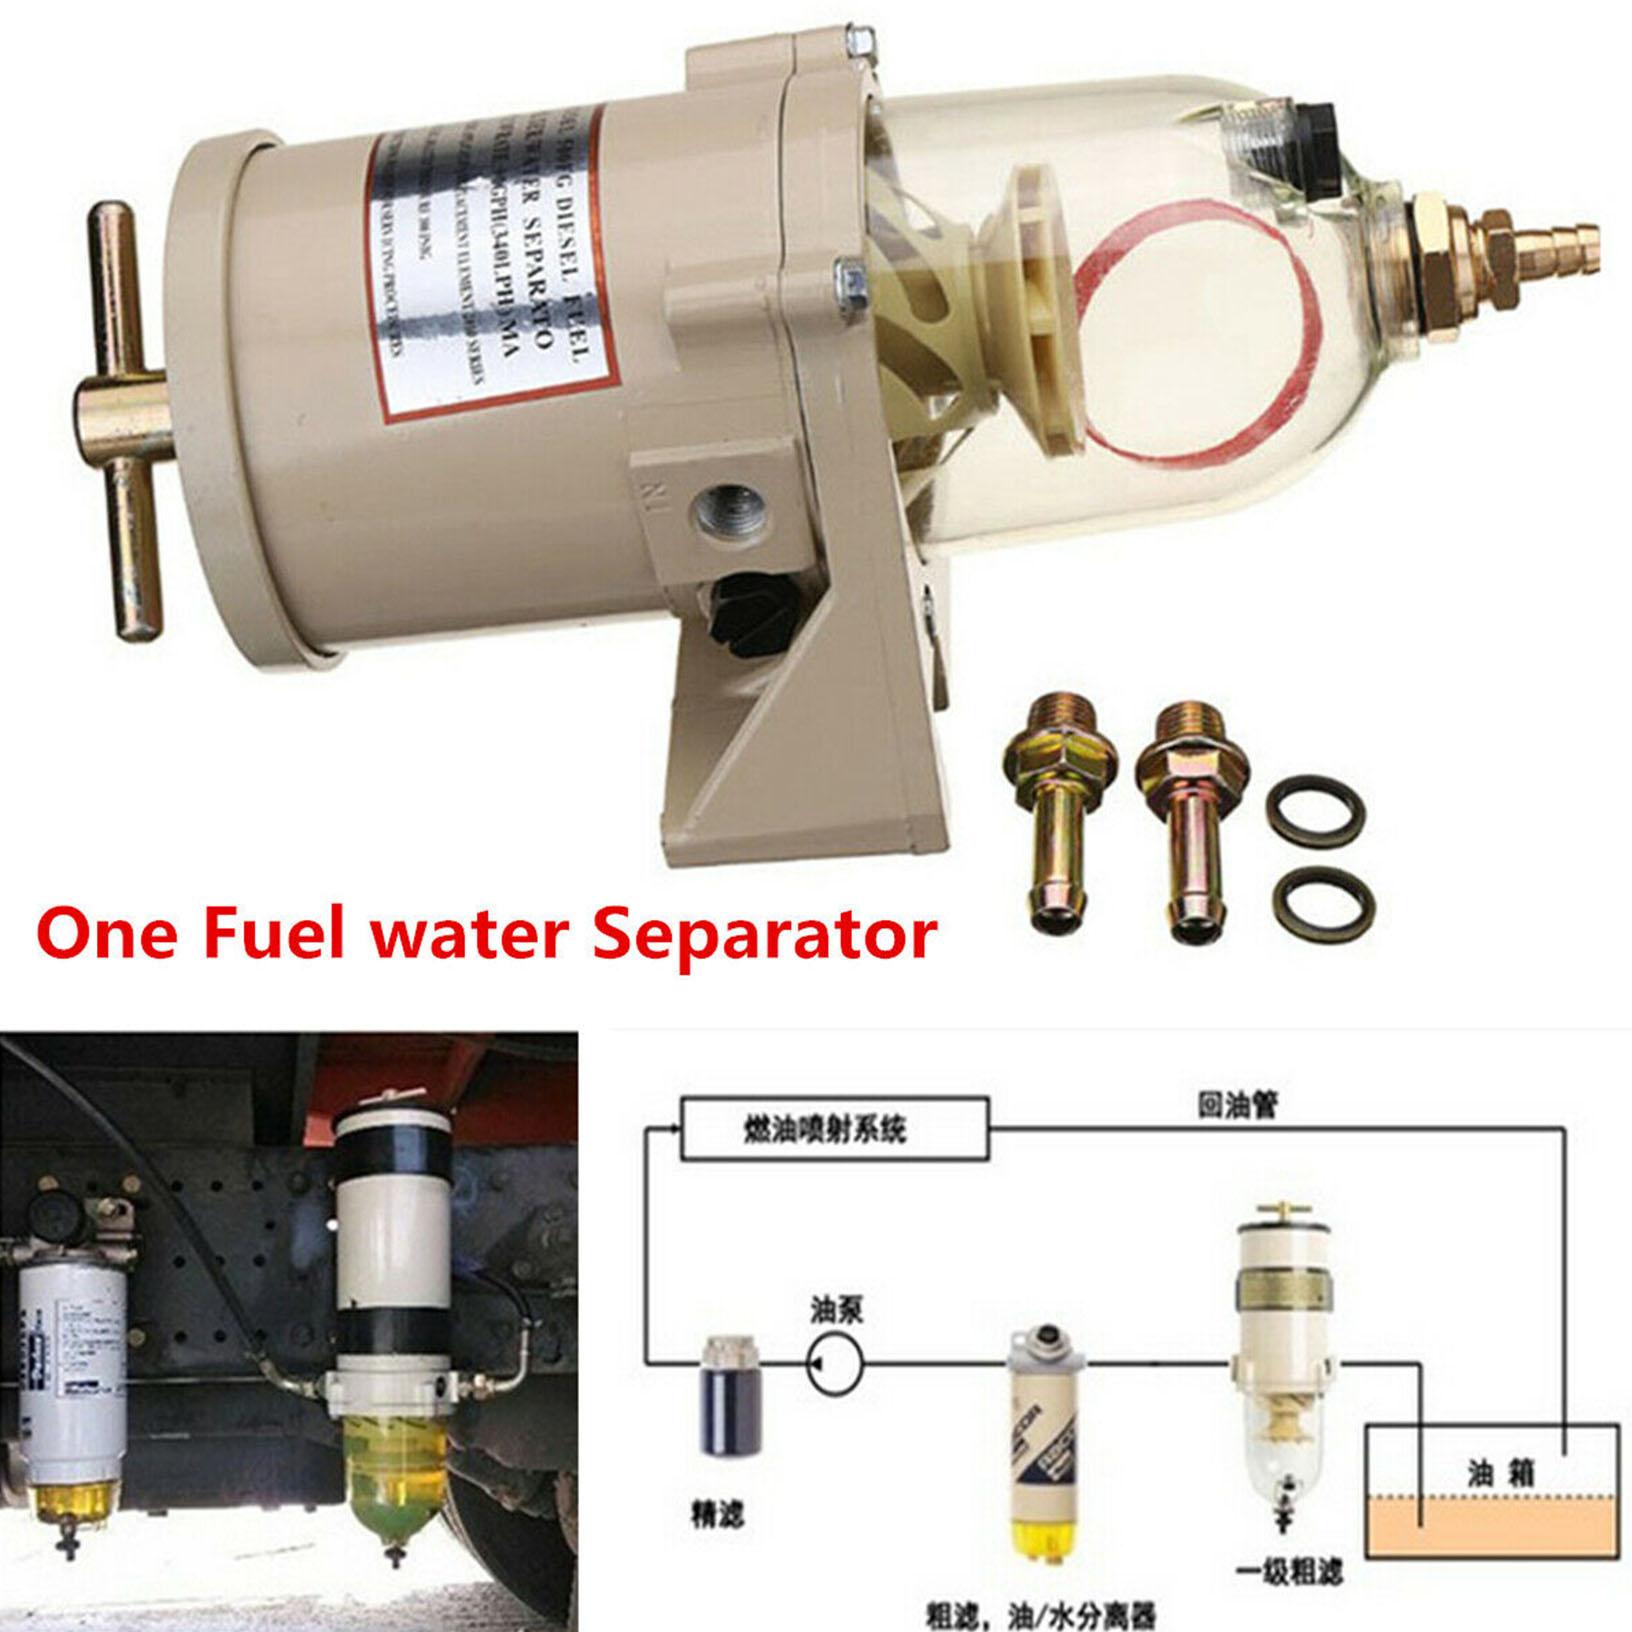 diesel truck diesel marine boat fuel filter / water separator 500fg 500fh |  ebay  ebay